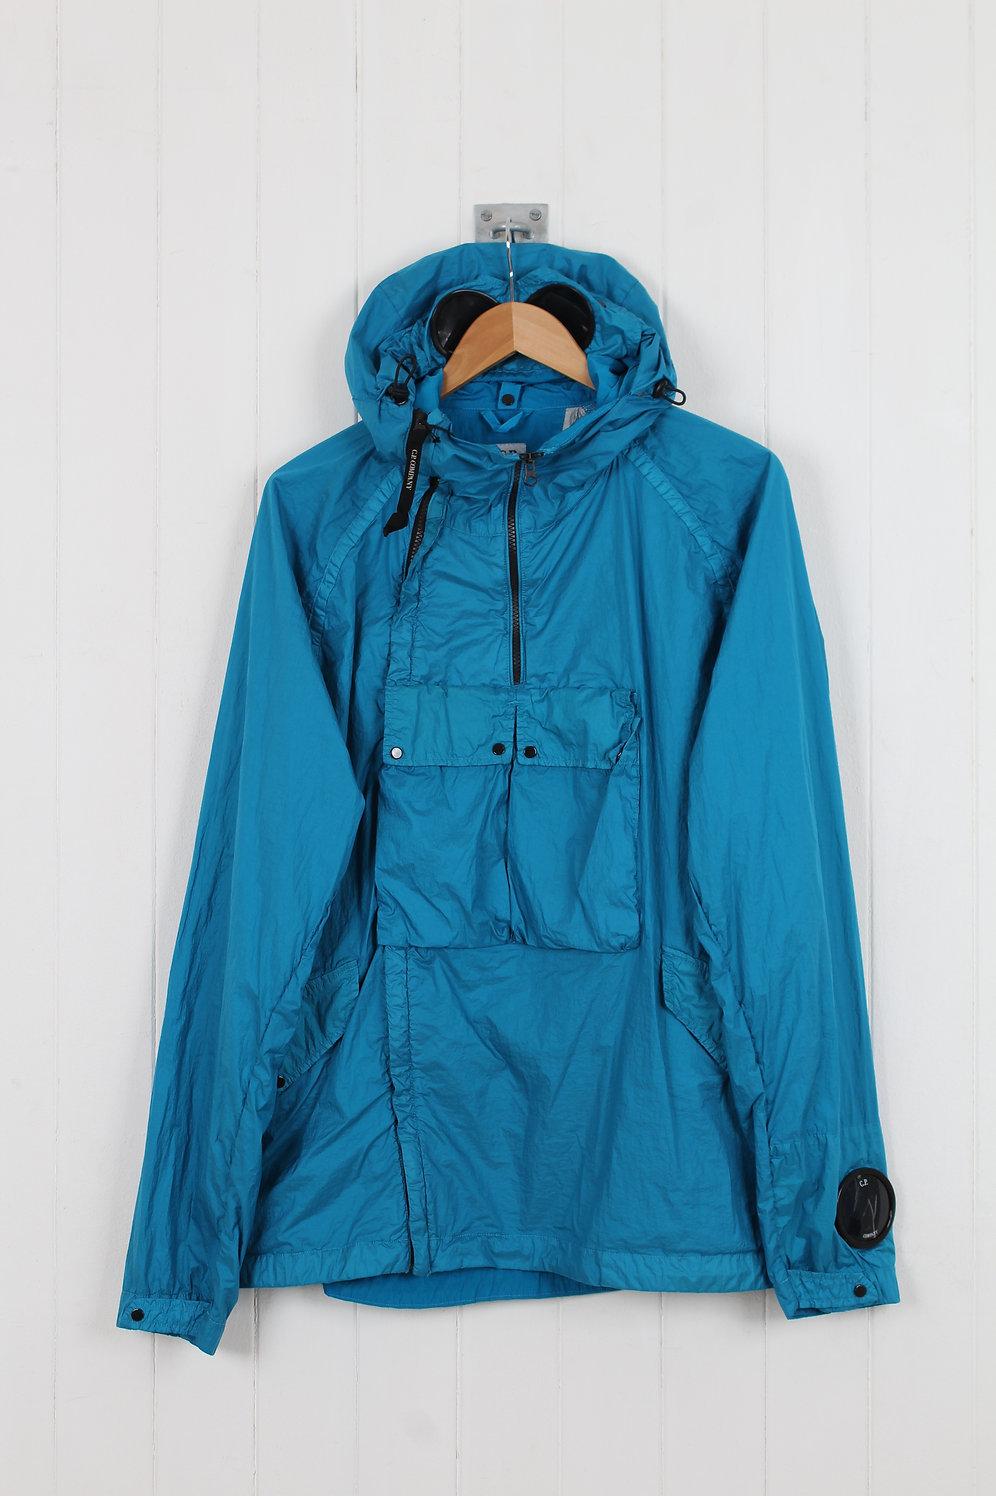 84e616495 C.P Company Nyfoil Goggle jacket | 6t2clothing